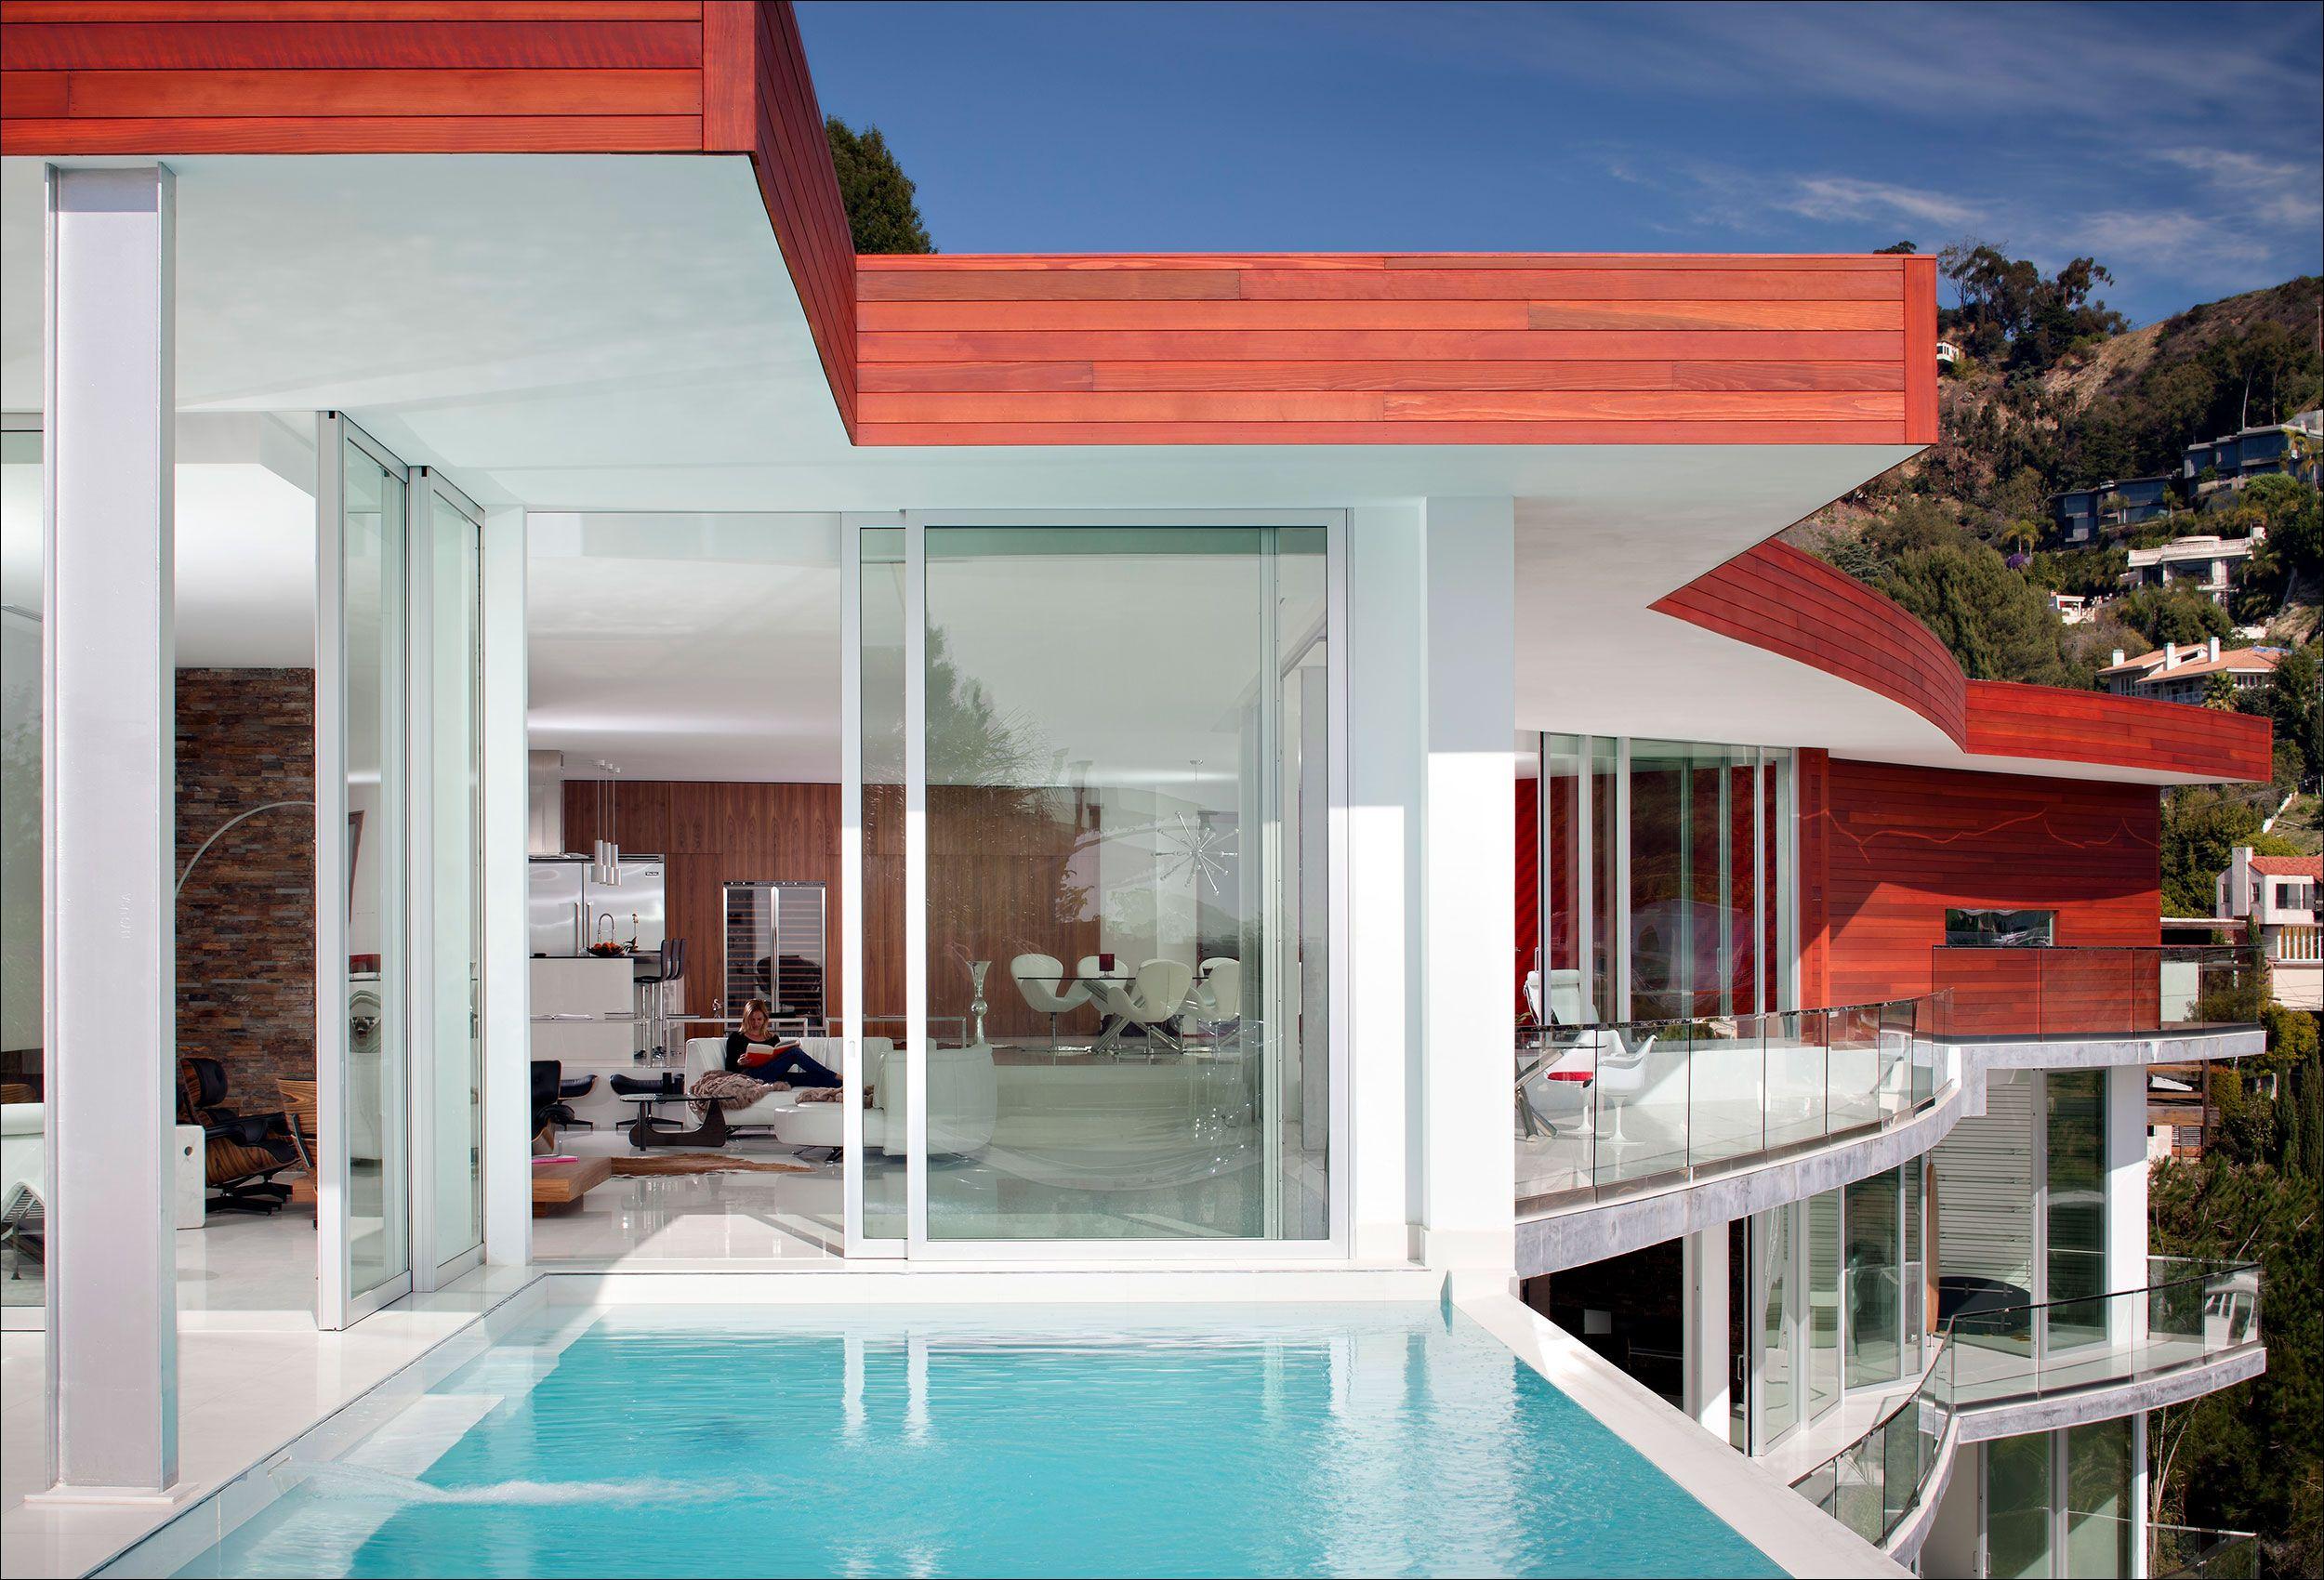 WeilandWindows_HollywoodHills_LosAngeles_ResidentialArchitecturePhotography.jpg